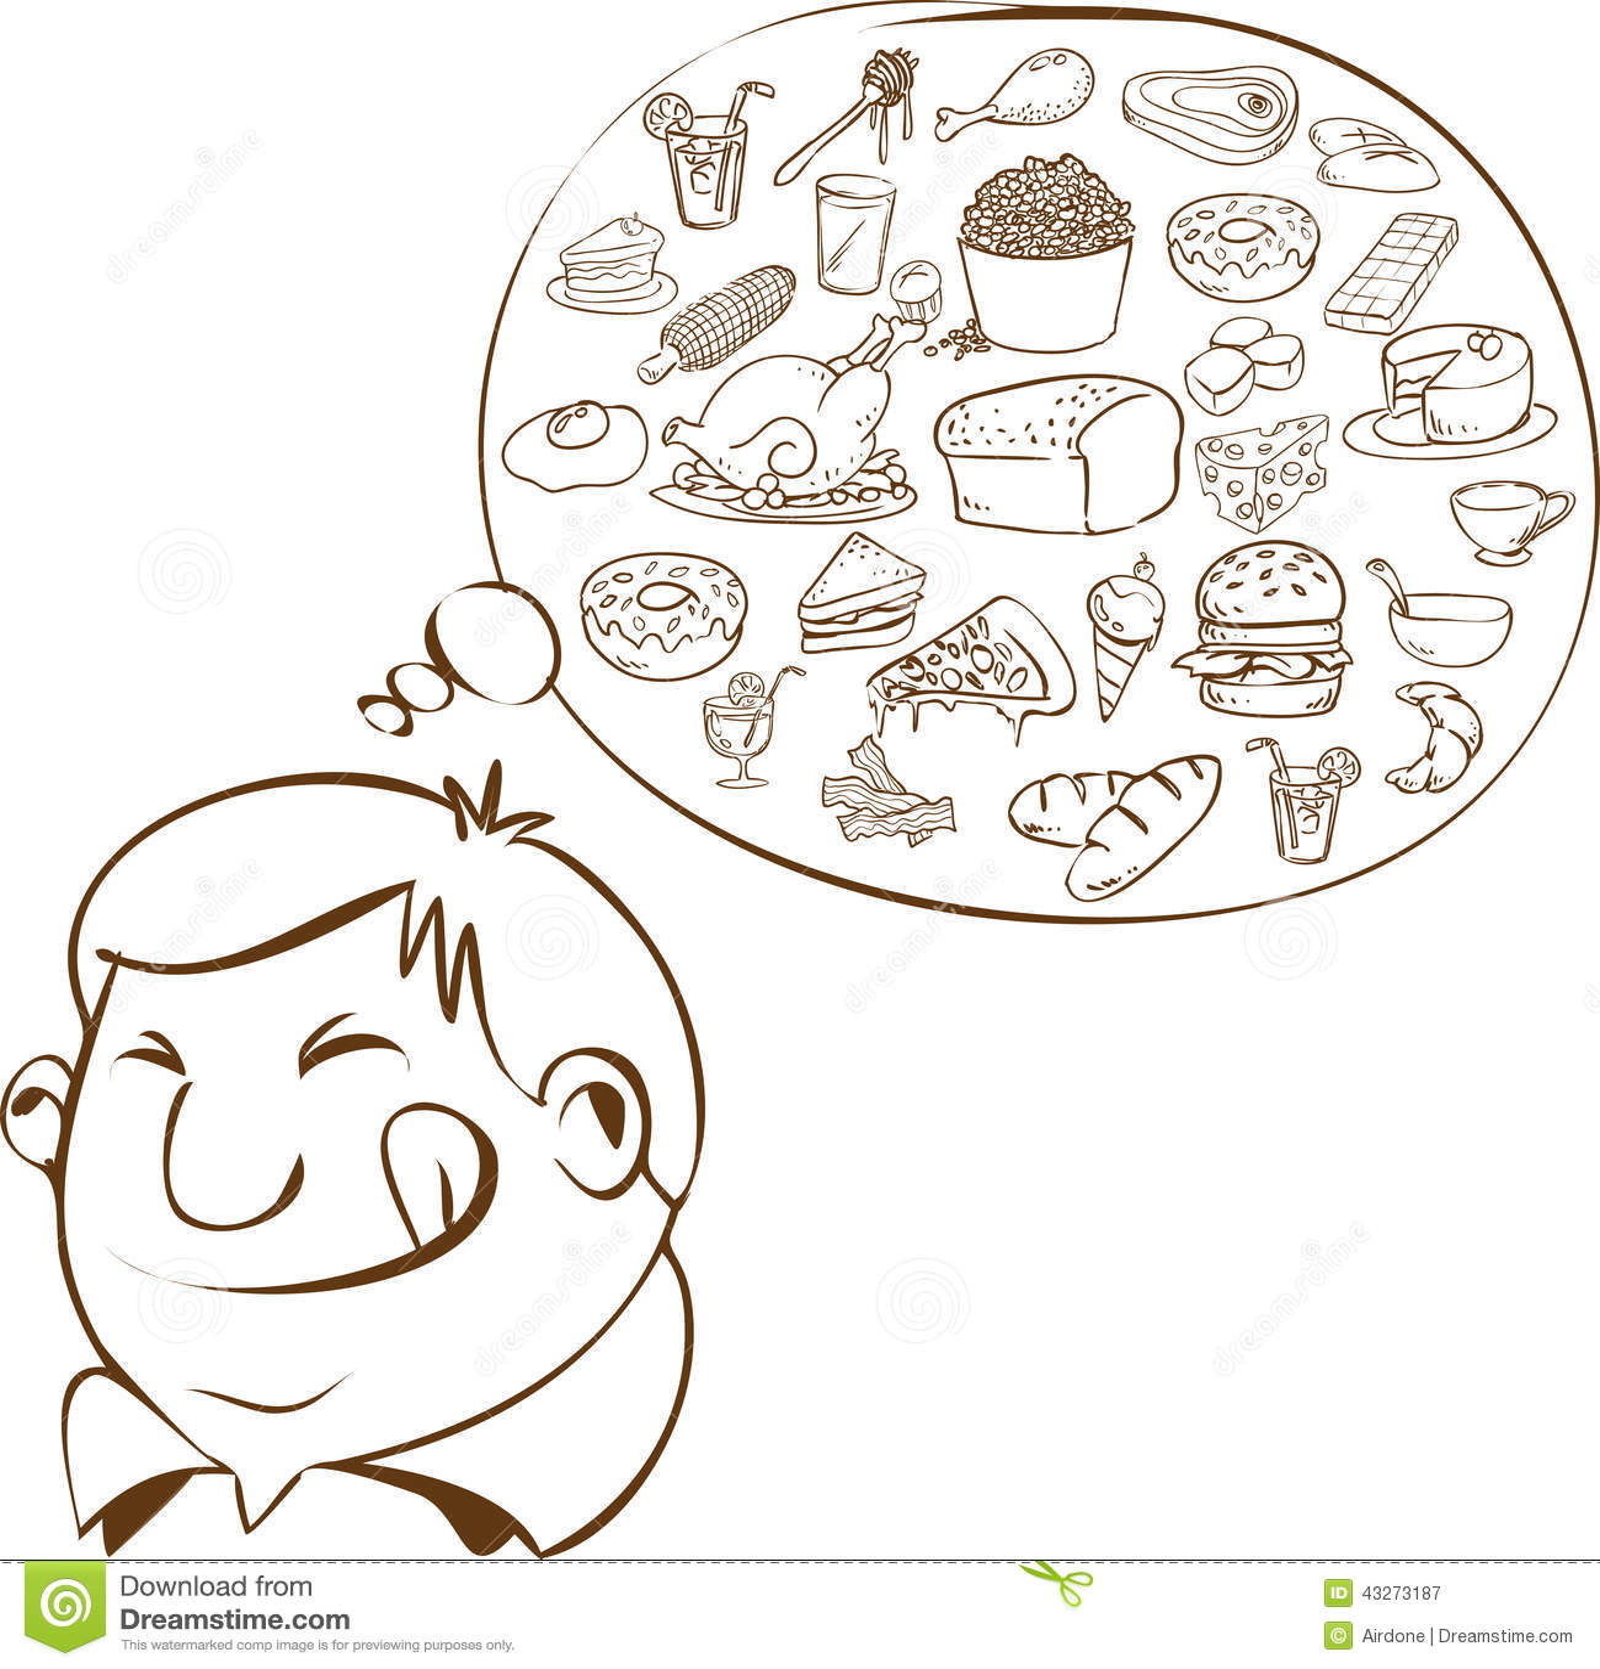 What dreams of food 100